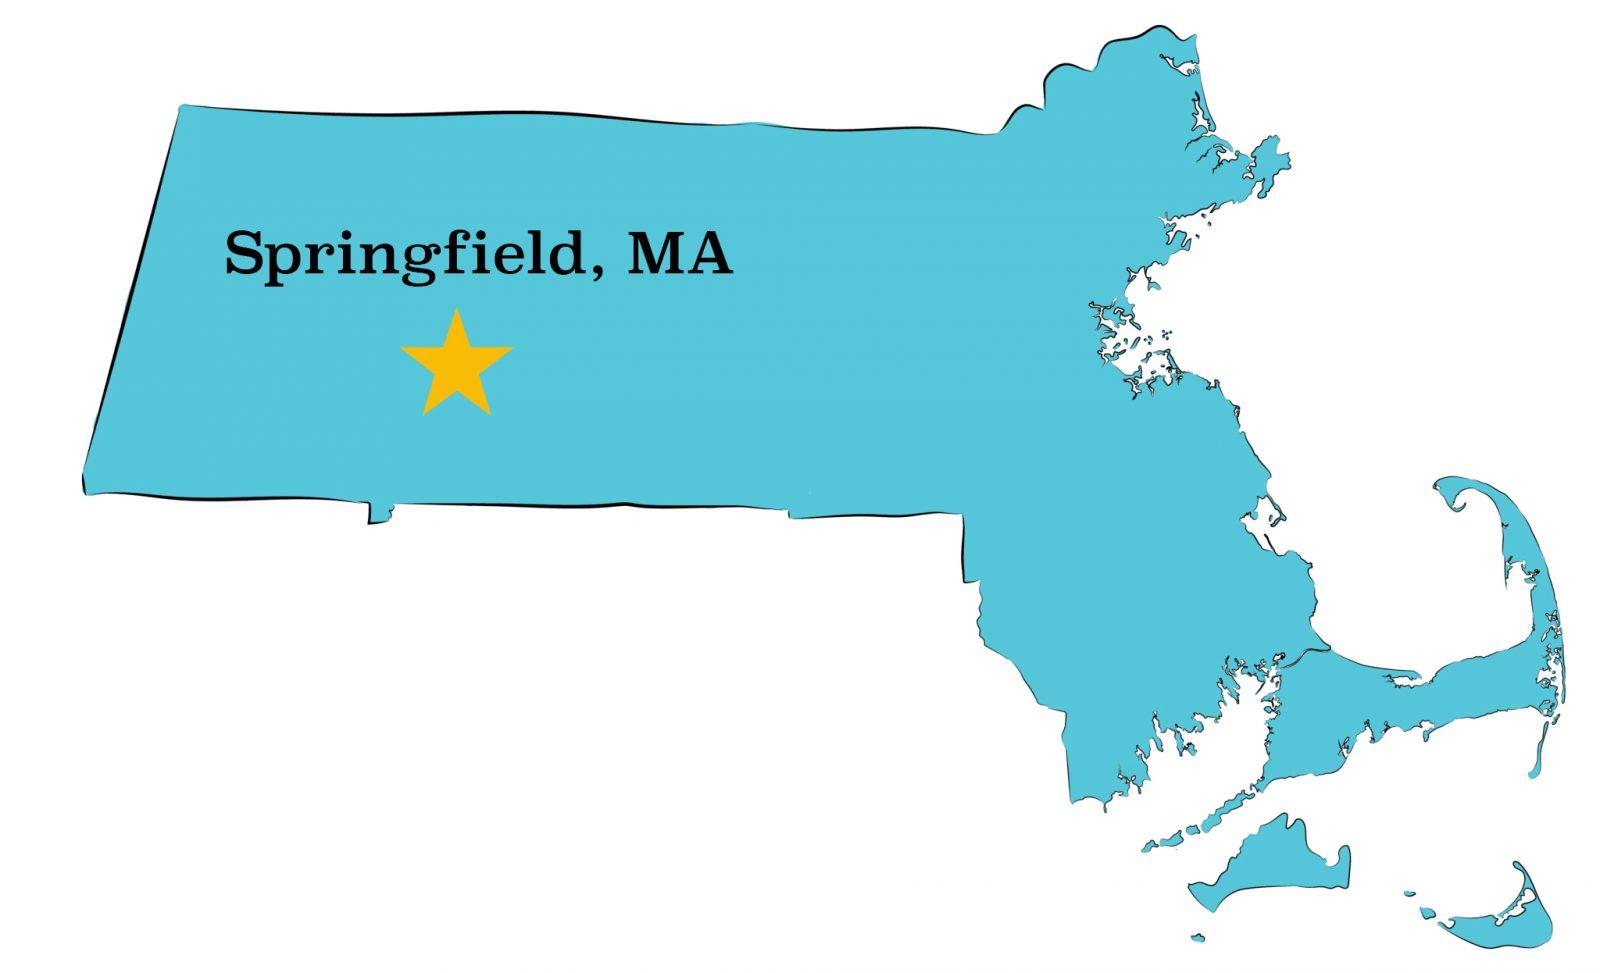 springfield ma